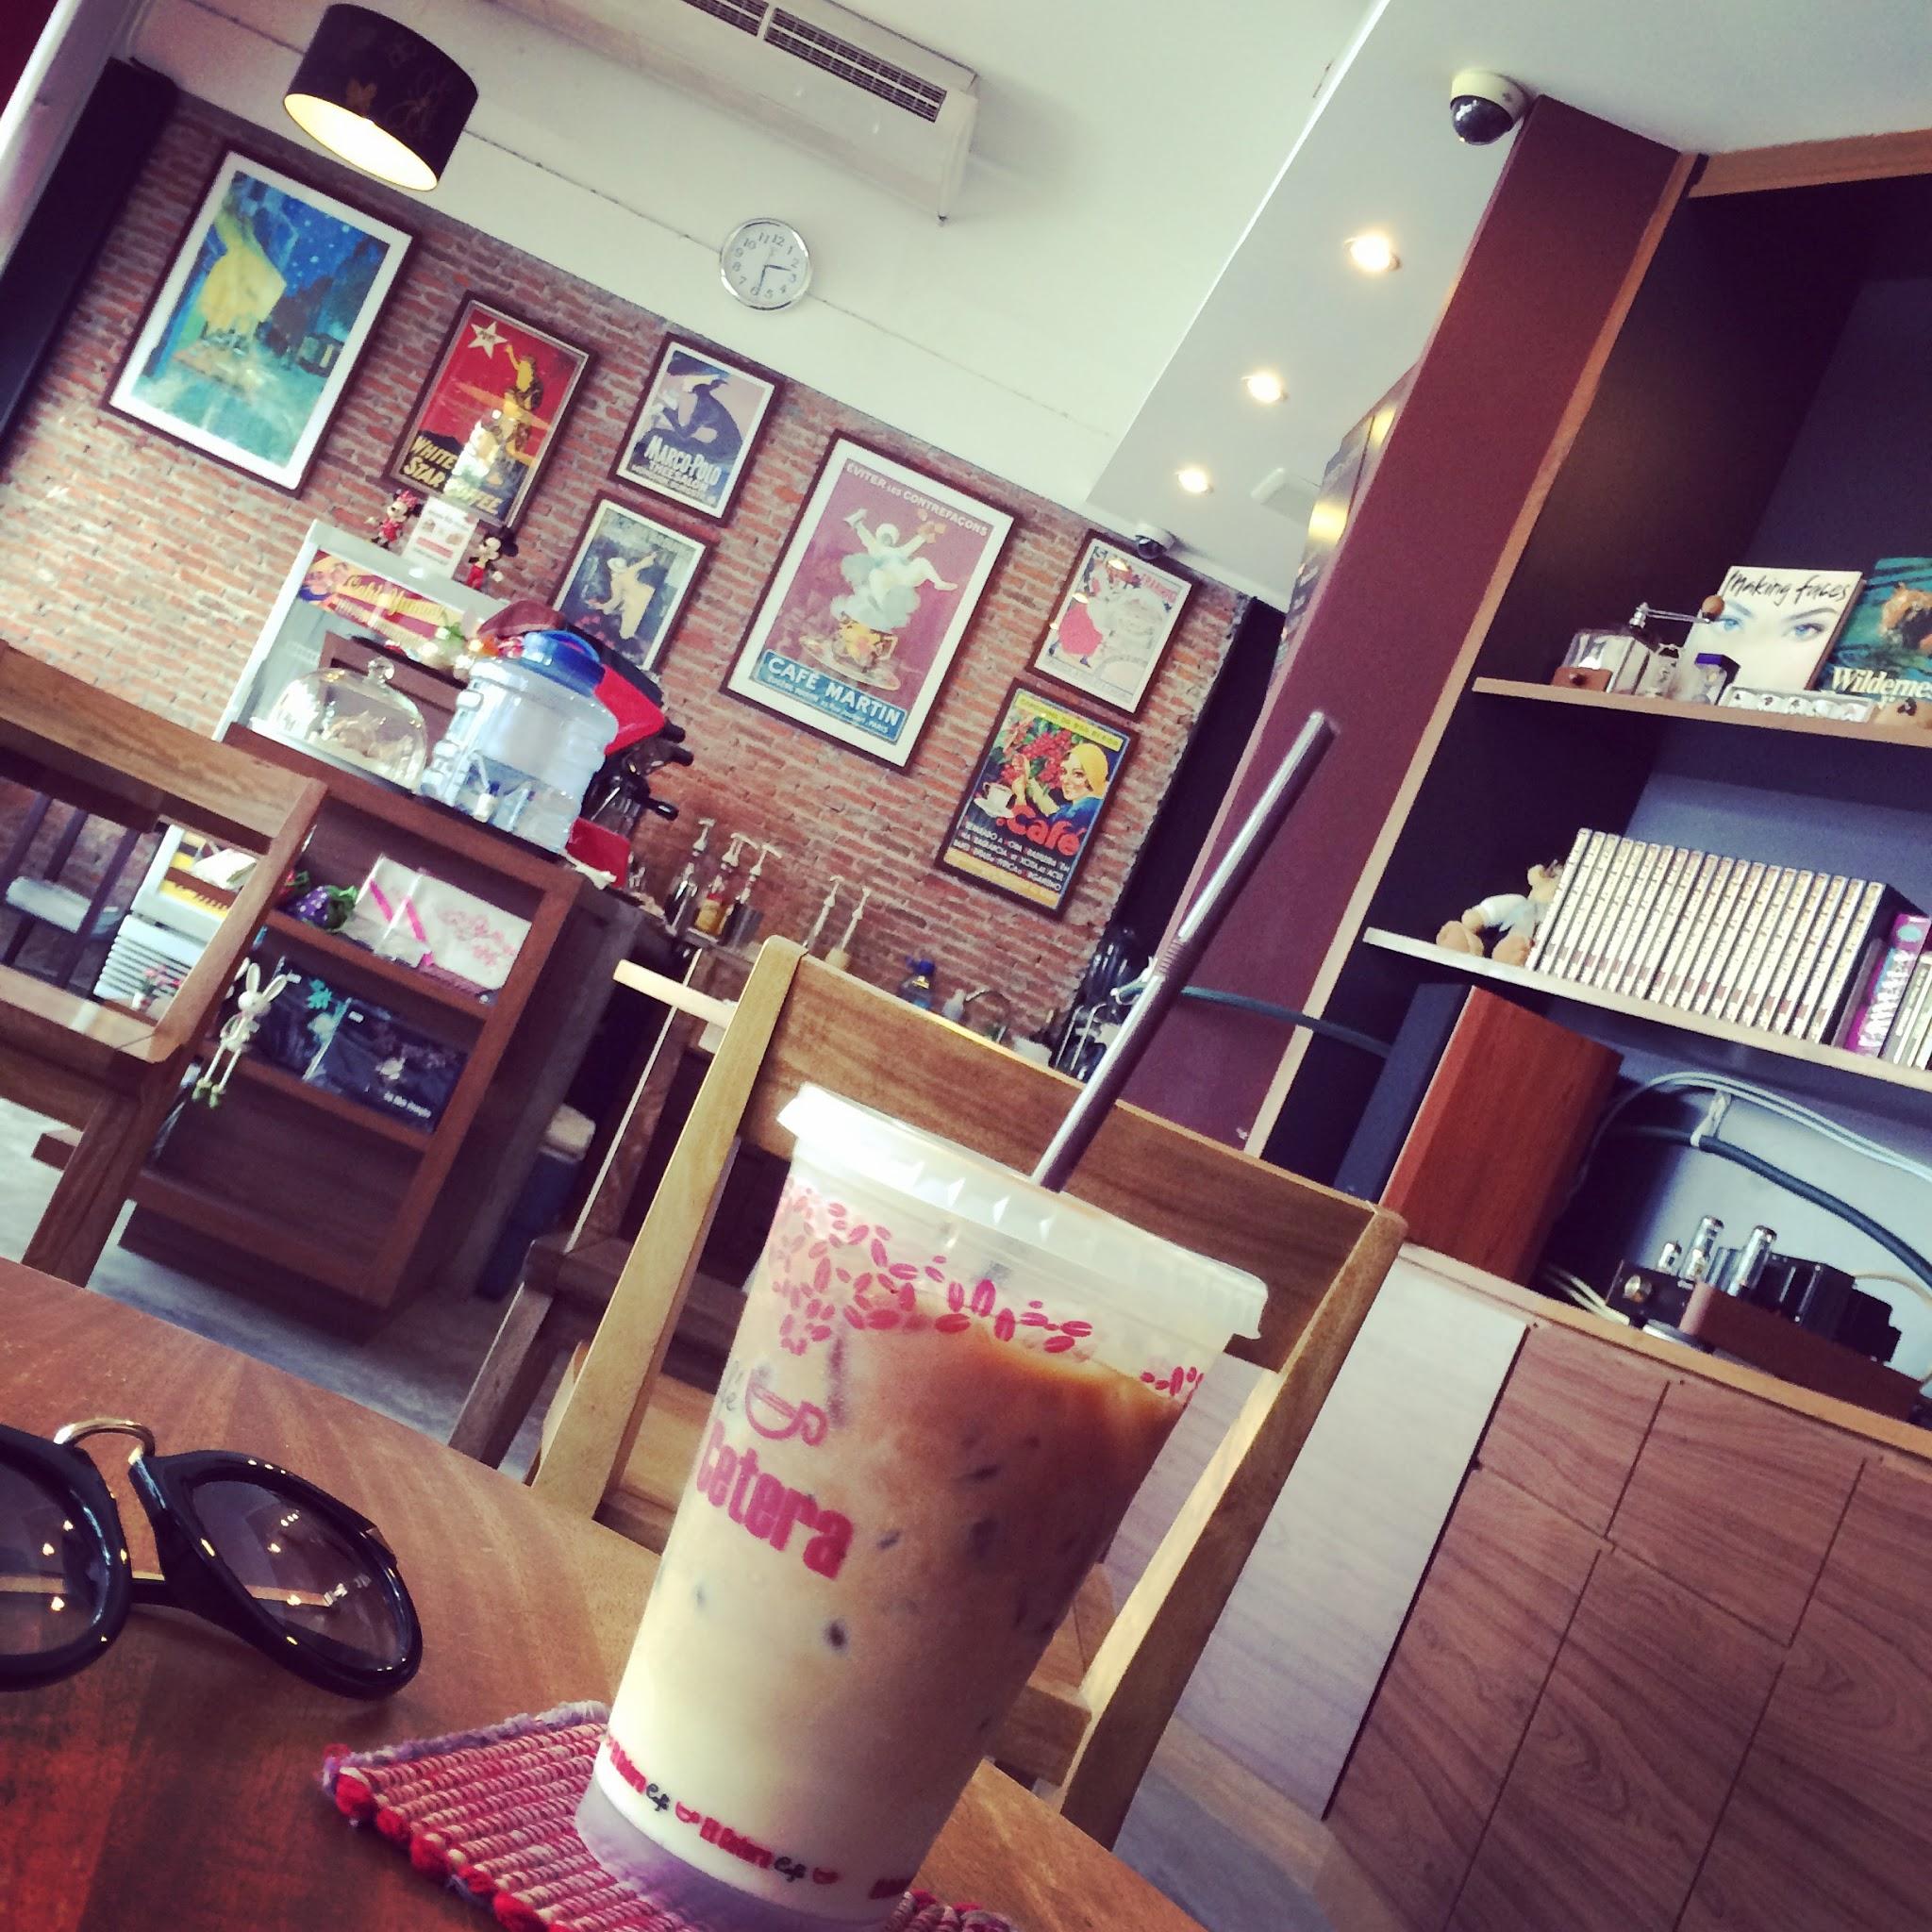 Wi-Fiが使える+長居できる!居心地の良いバンコク市内カフェ3選